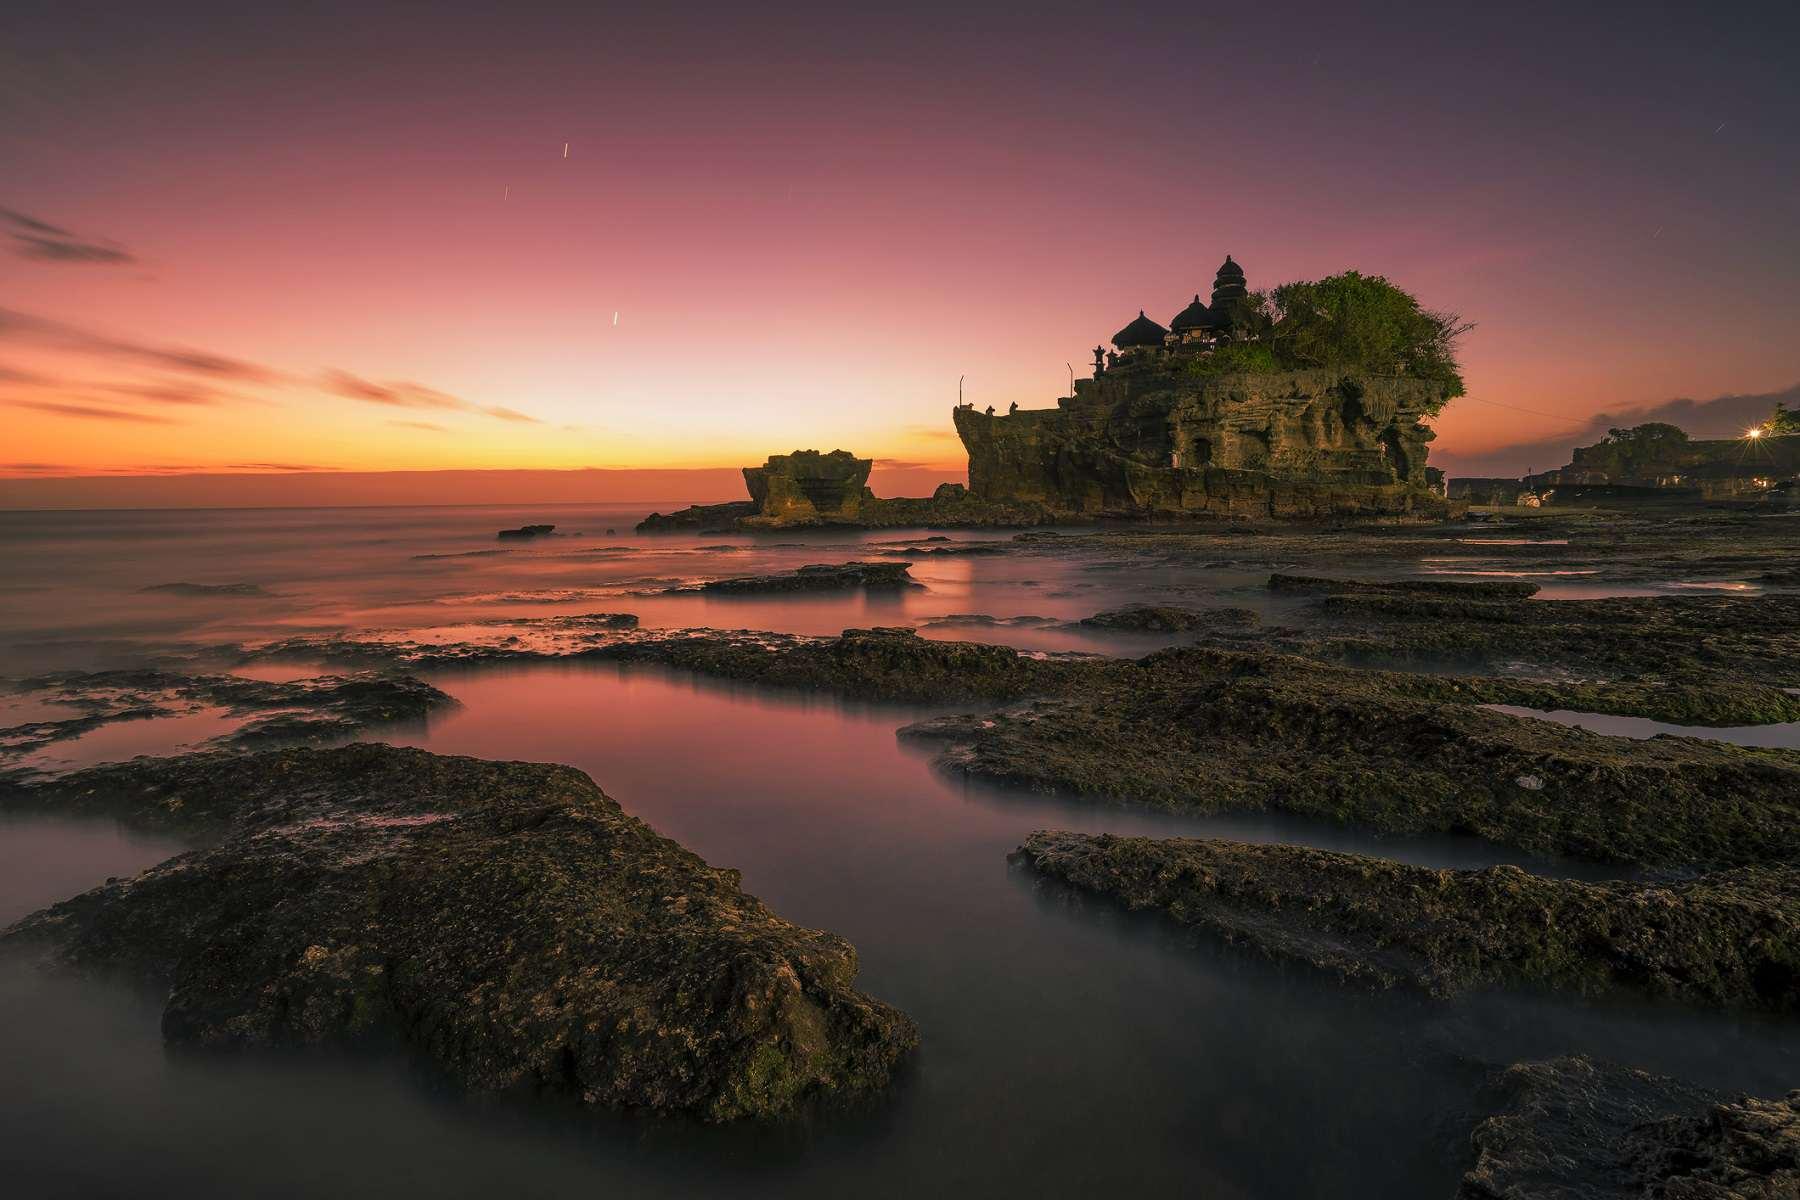 Puesta de sol en Tanah Lot, Bali, Indonesia